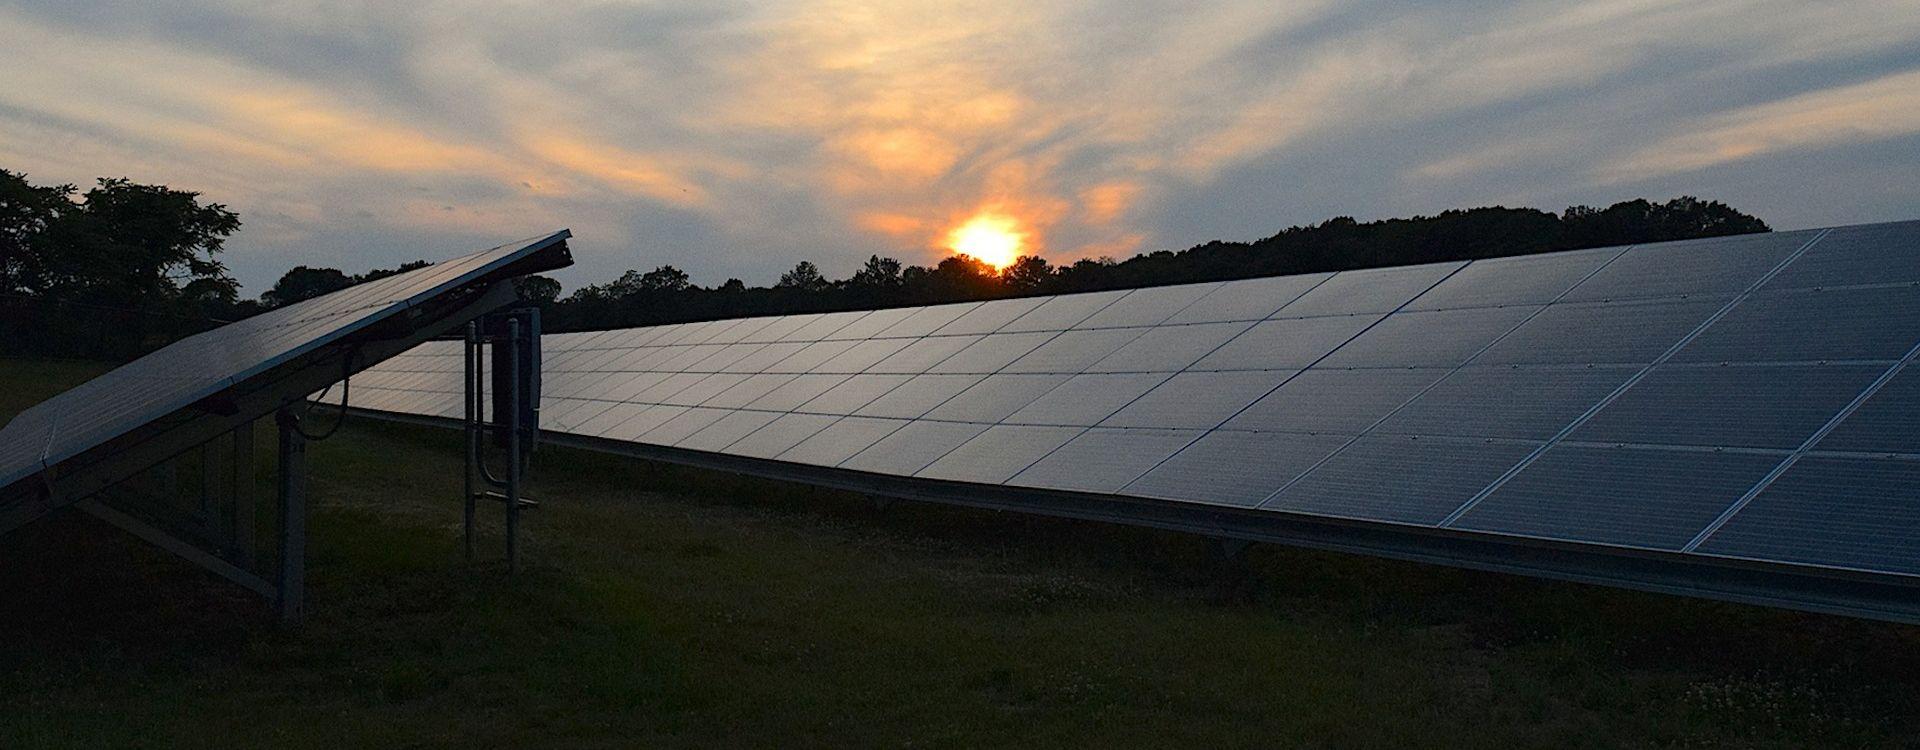 Solarpack, penúltima víctima del  burbujón en la fotovoltaica